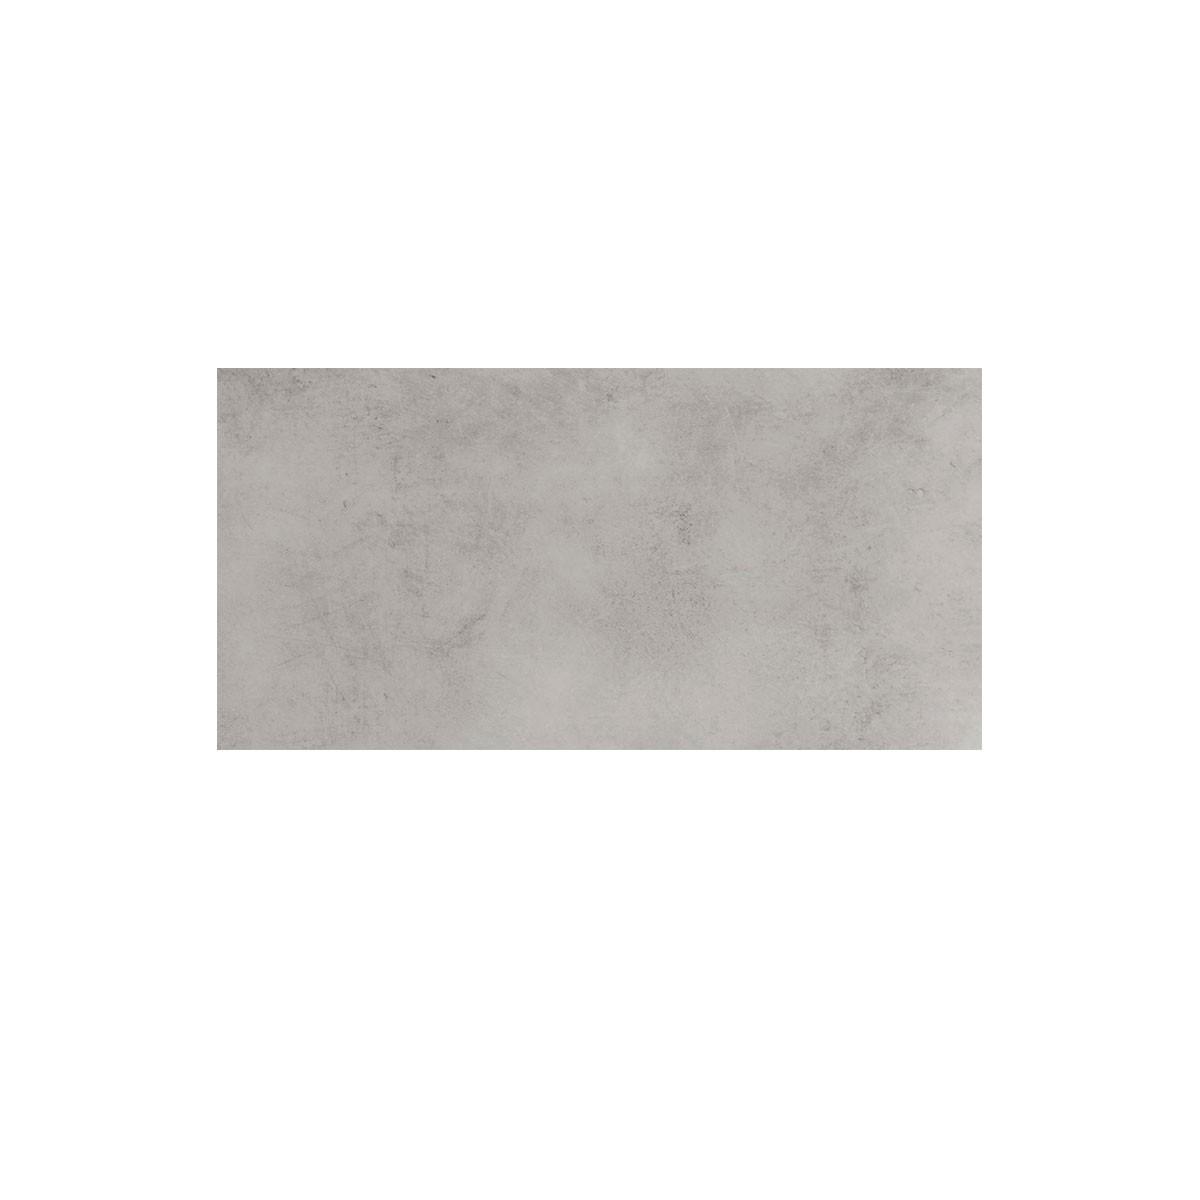 DECORAPORT NSM Panneau Mural, Lumière Luxor,4'' x6'' (NLS-01) (Échantillon)